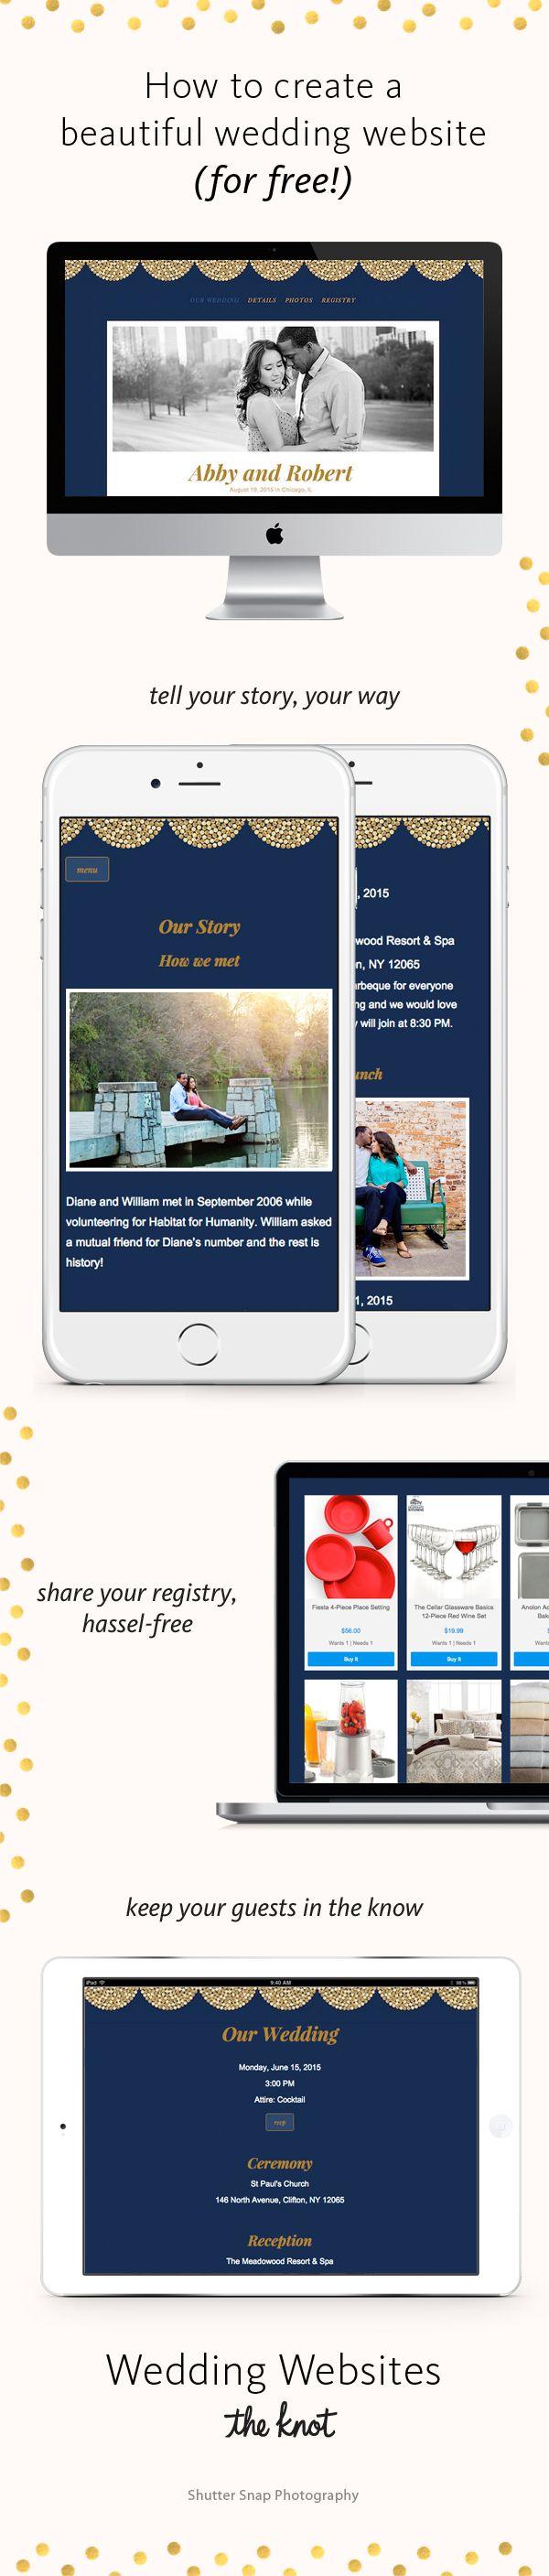 Best 25+ Wedding website ideas only on Pinterest | Wedding tips ...